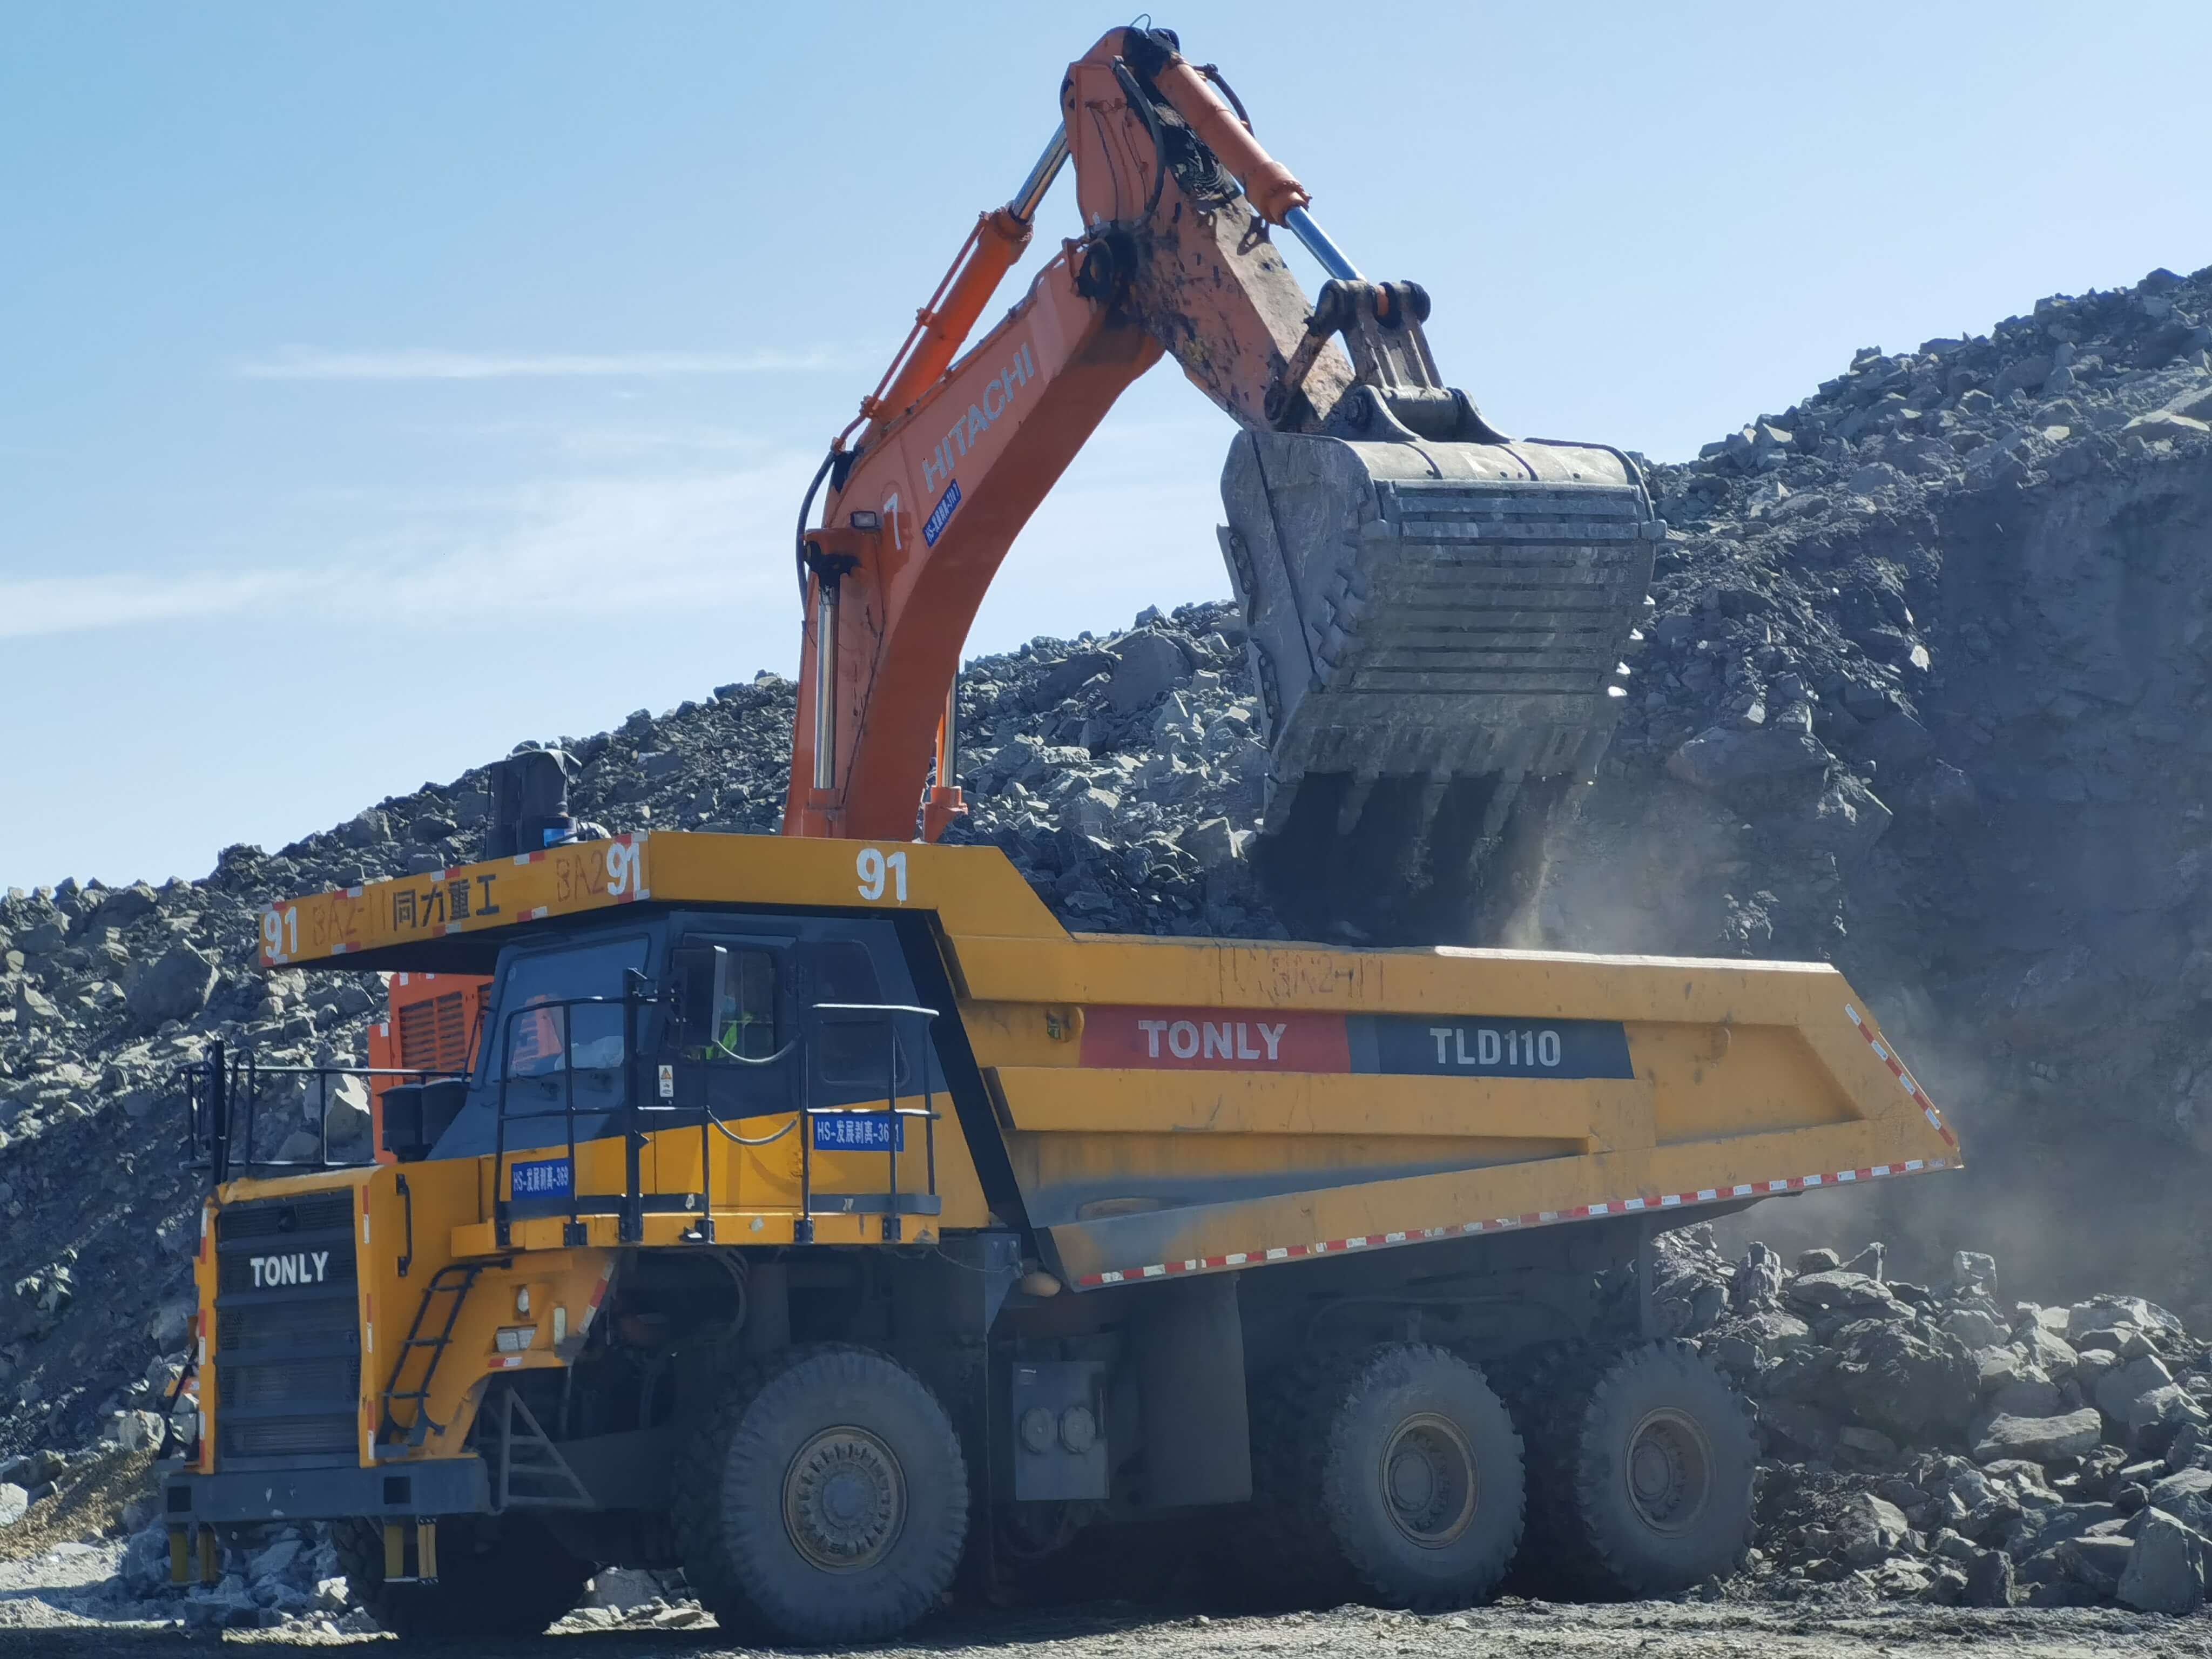 TLD110 Rigid Dump Truck Working in Open-Pit Mine of Xinjiang Province